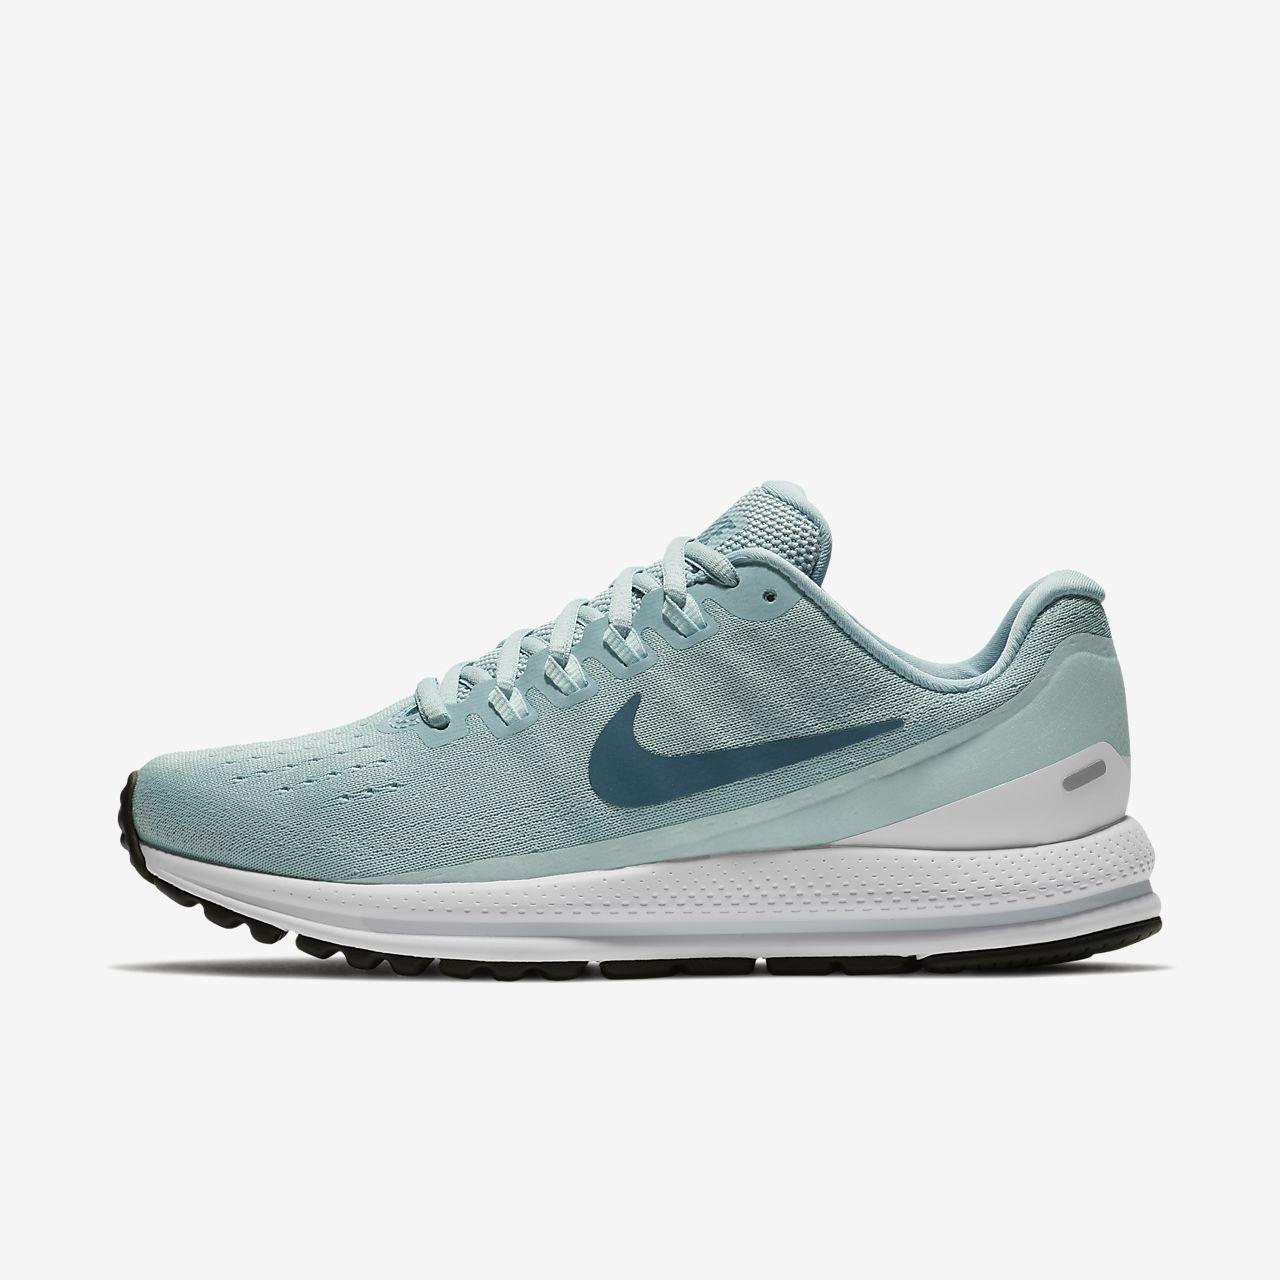 brand new 134c5 bda6c ... Chaussure de running Nike Air Zoom Vomero 13 pour Femme